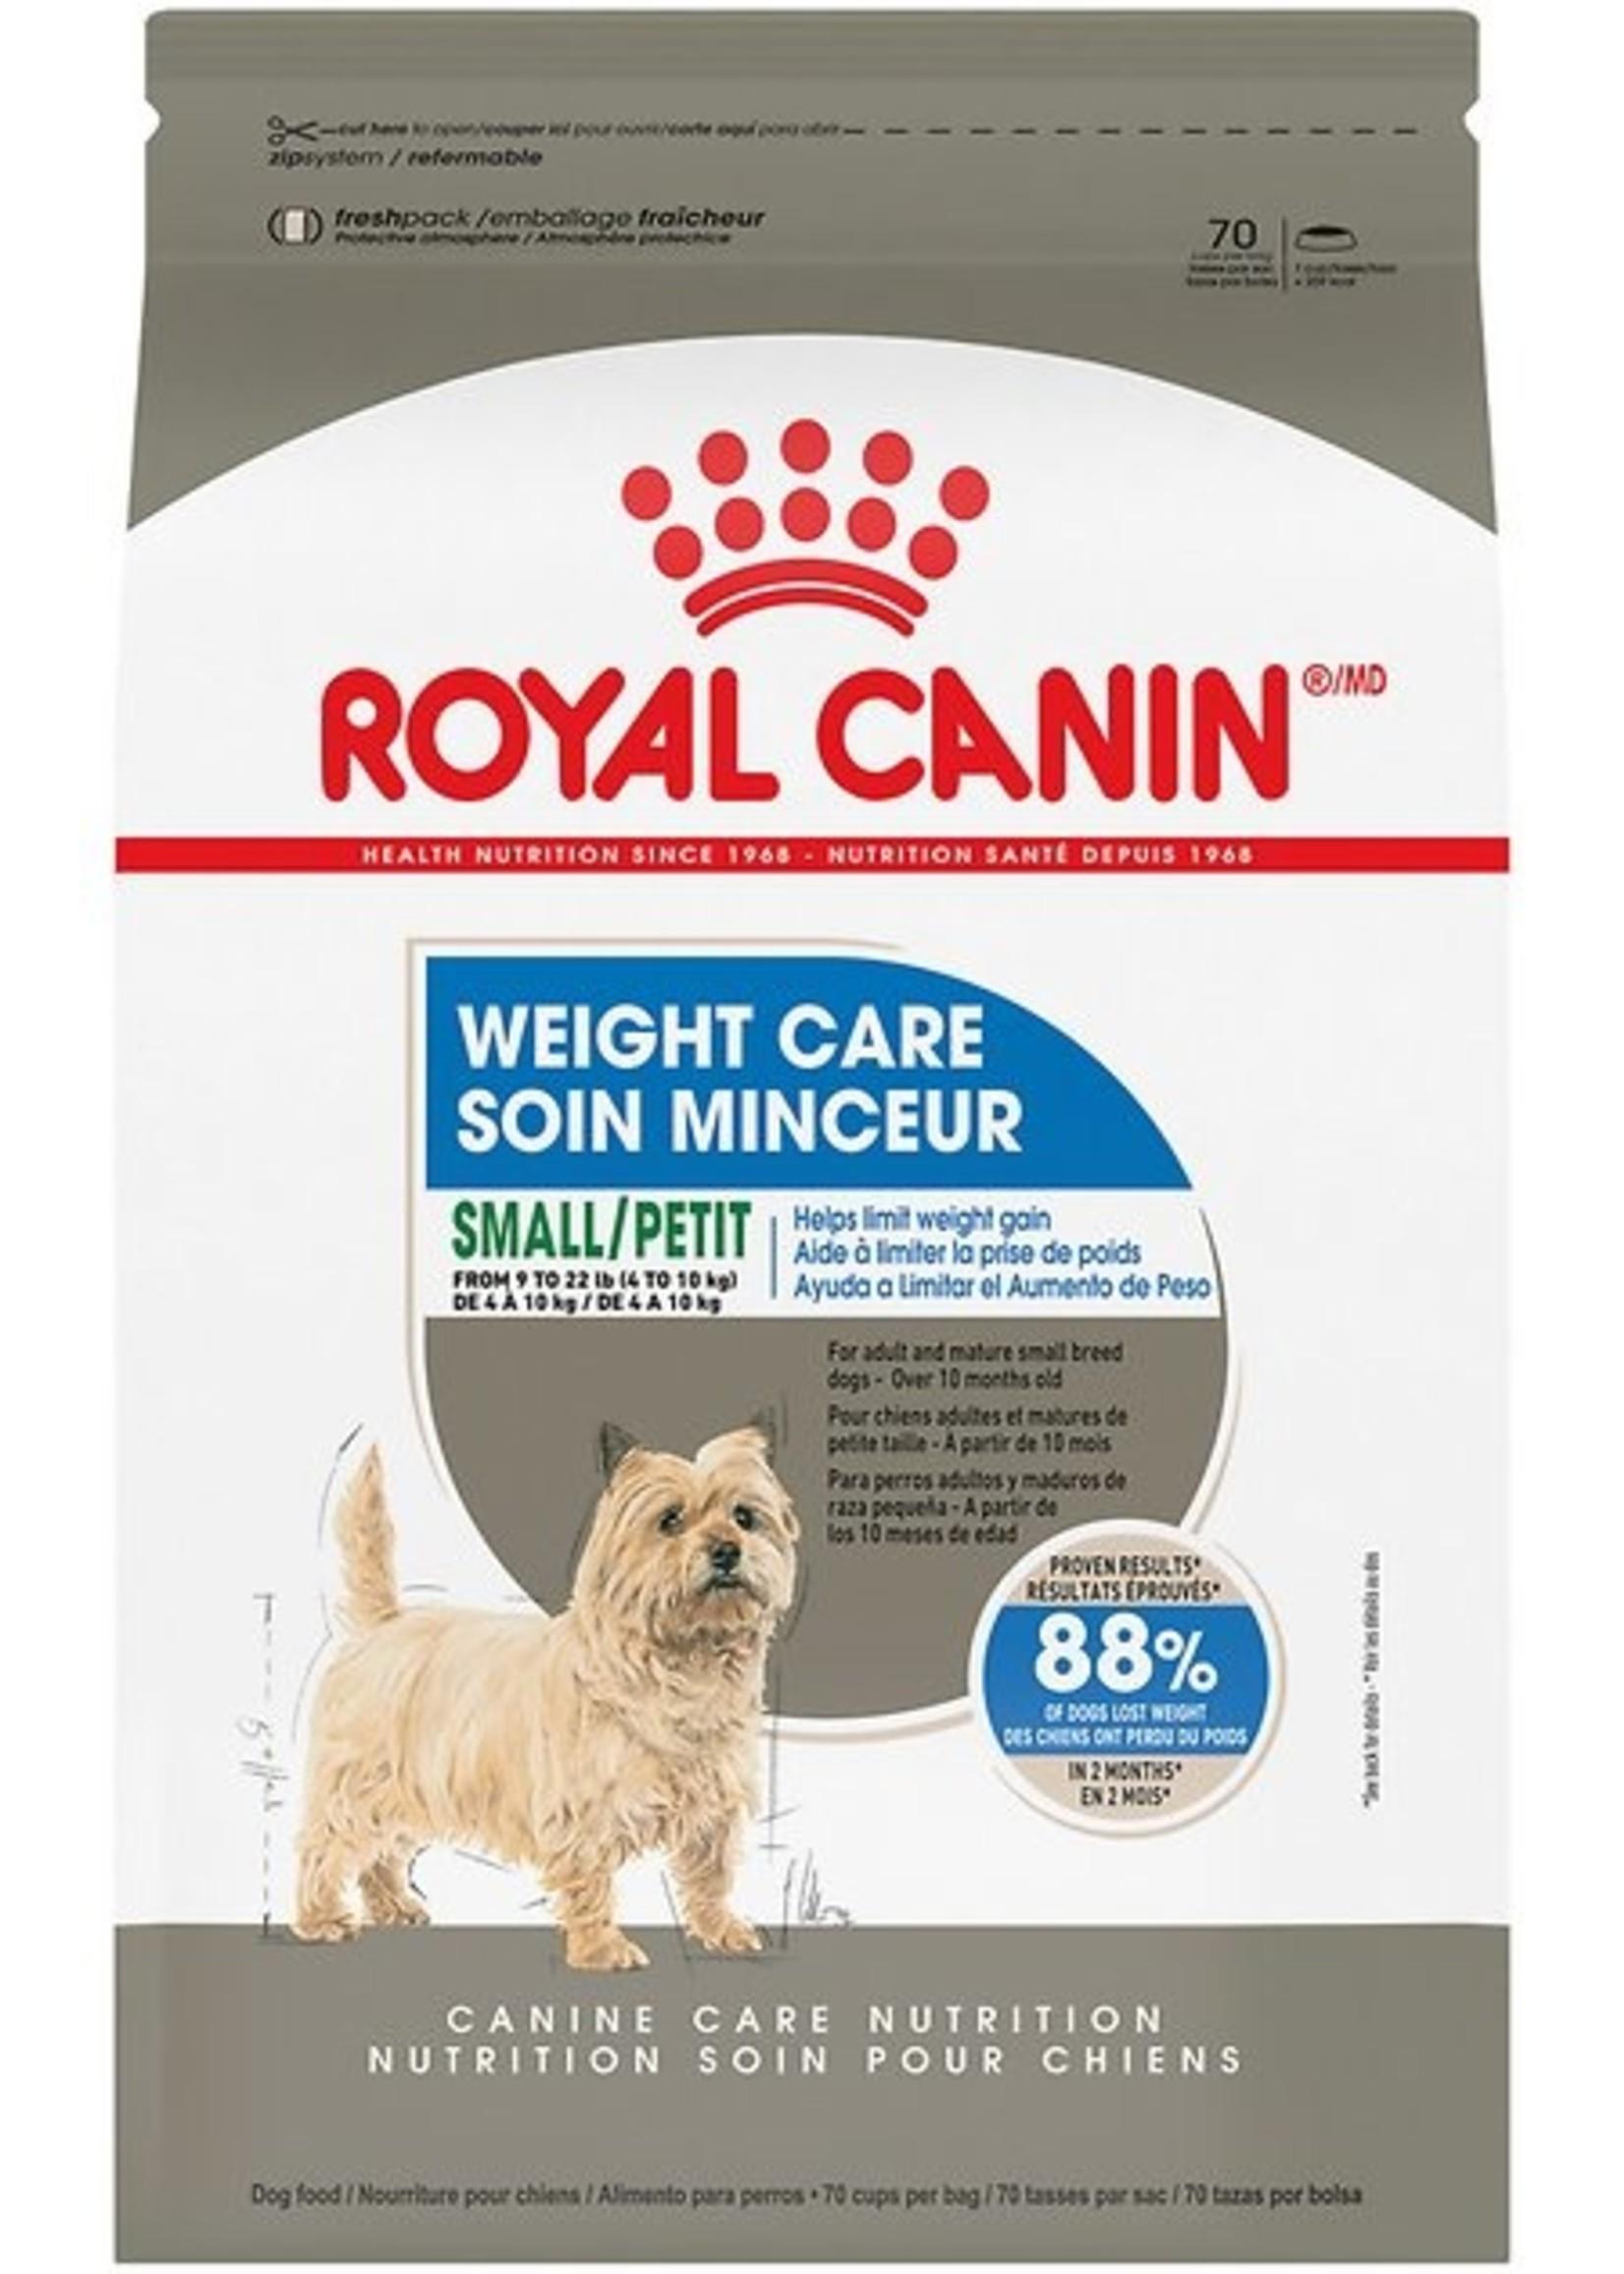 Royal Canin Royal Canin Dog Small Weight Care 2.5lb